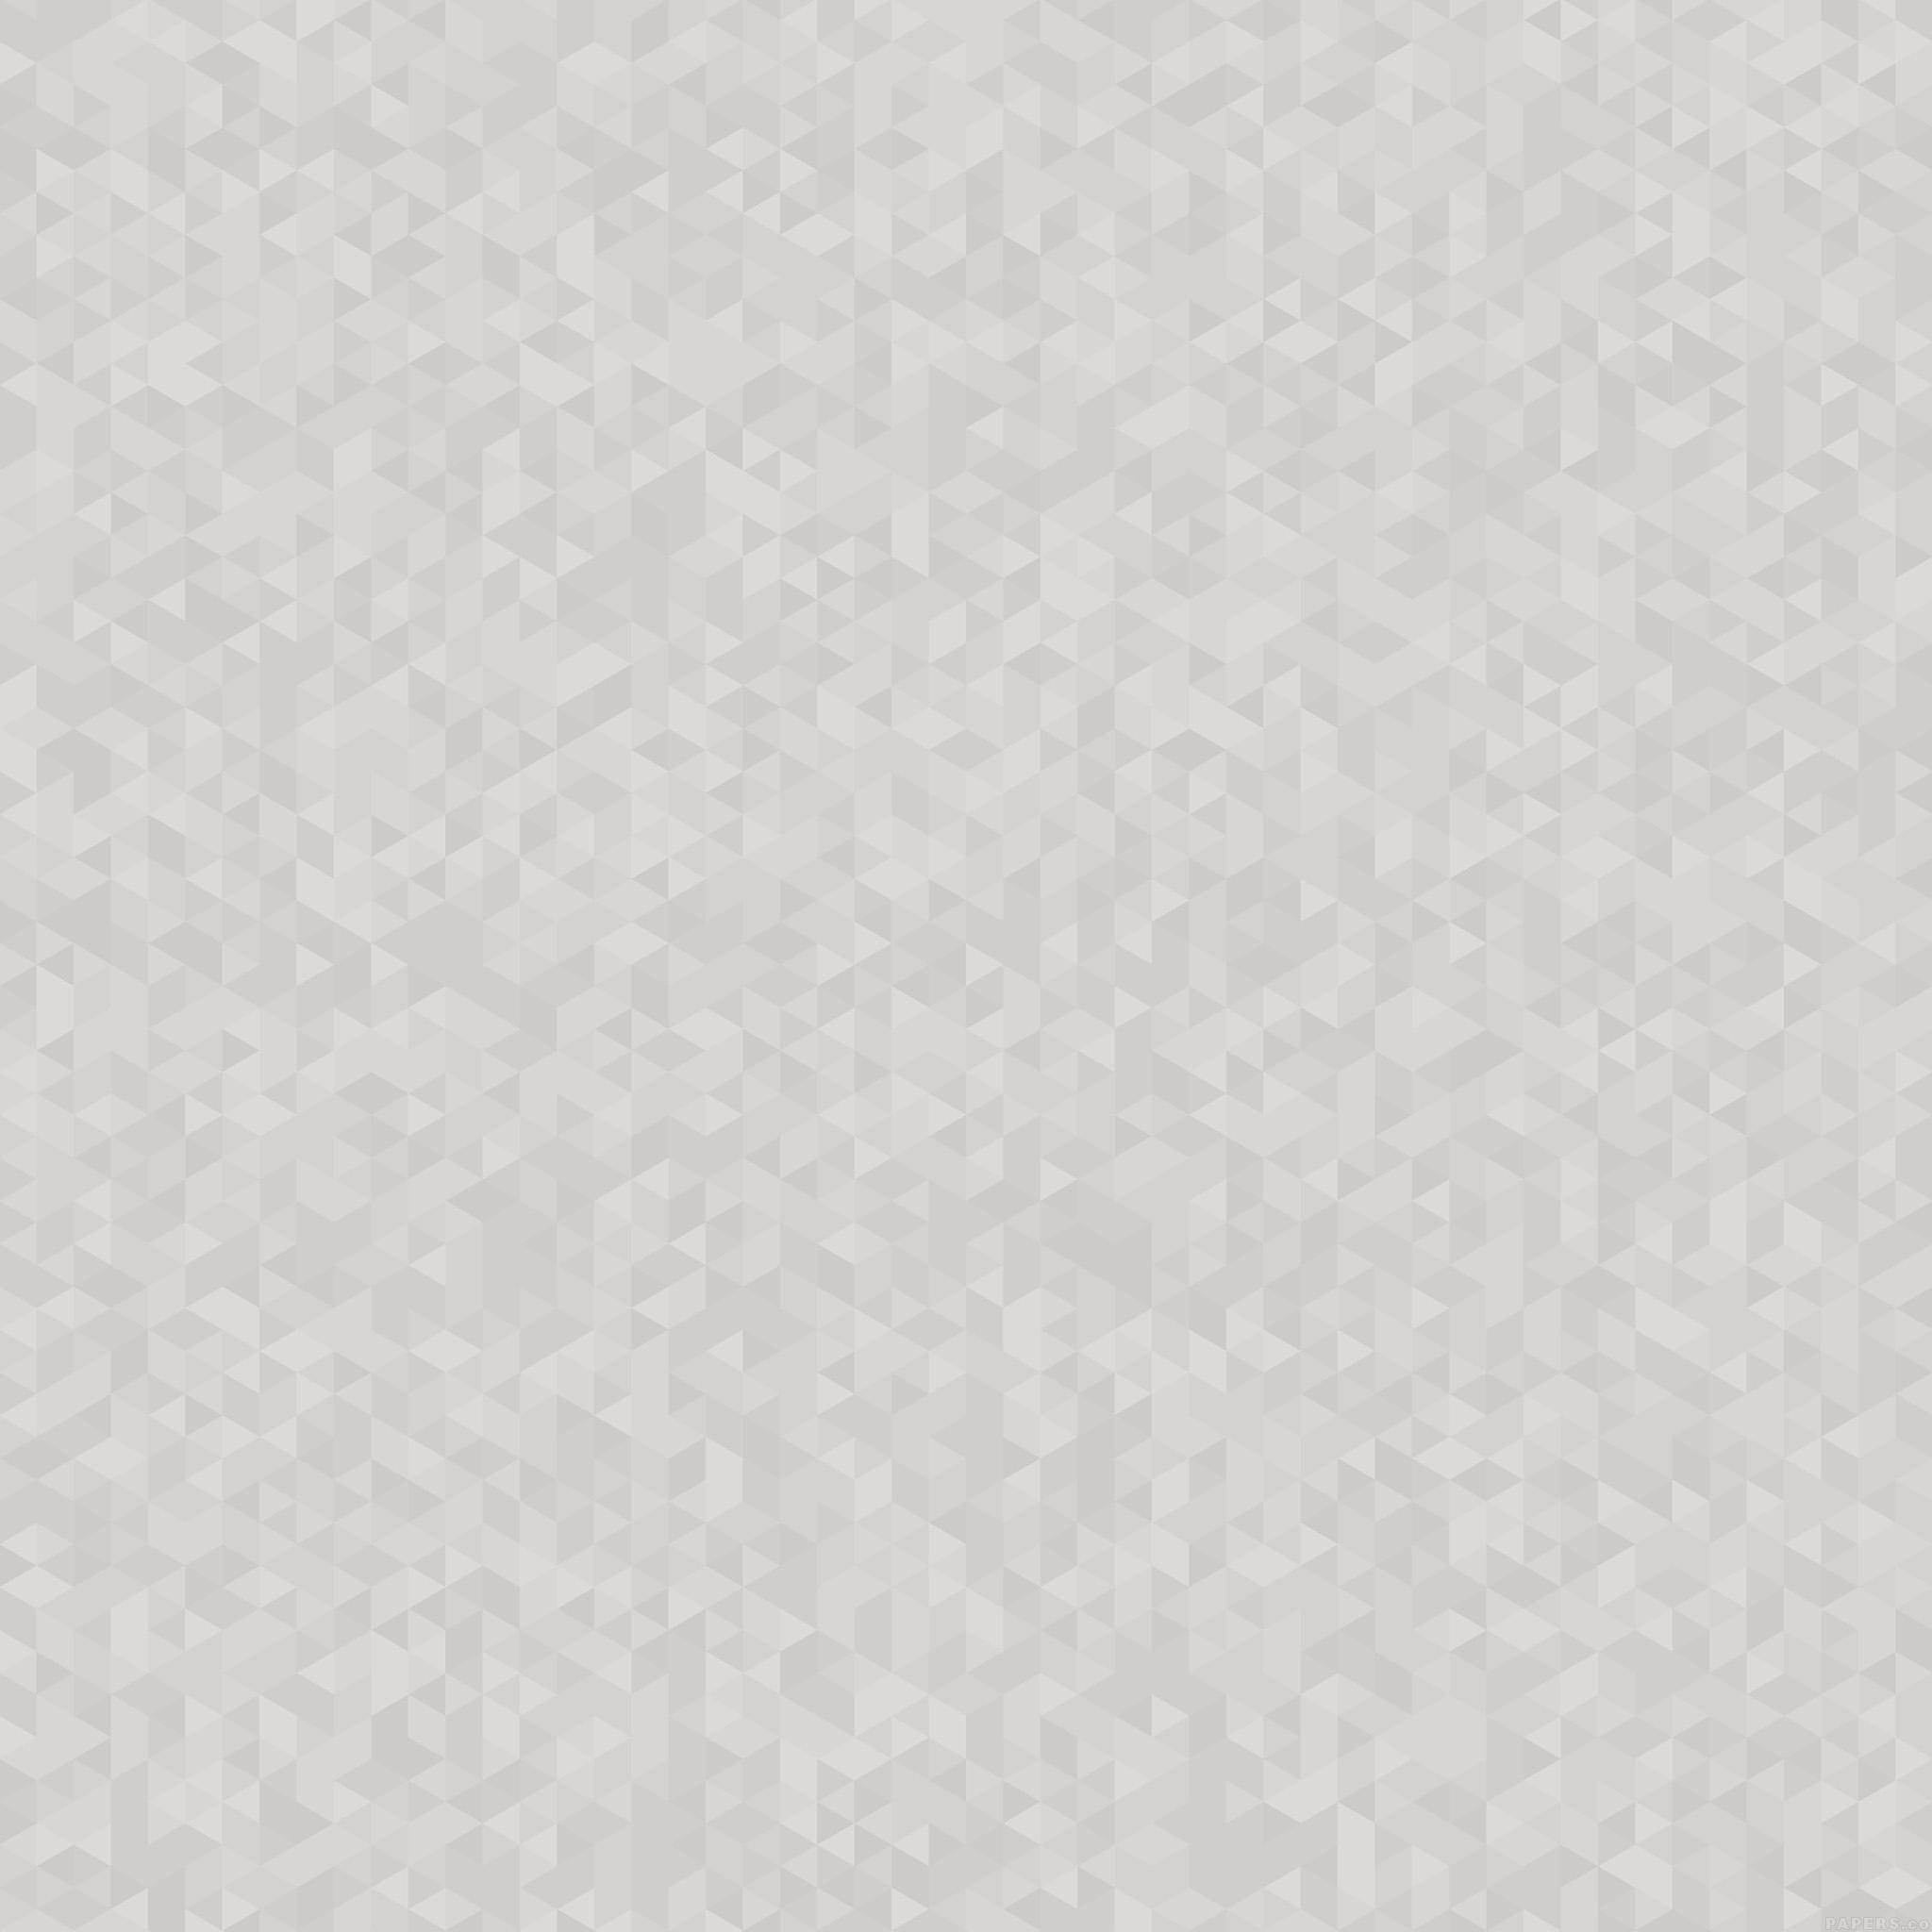 vg46-diamonds-abstract-art-white-pattern-wallpaper